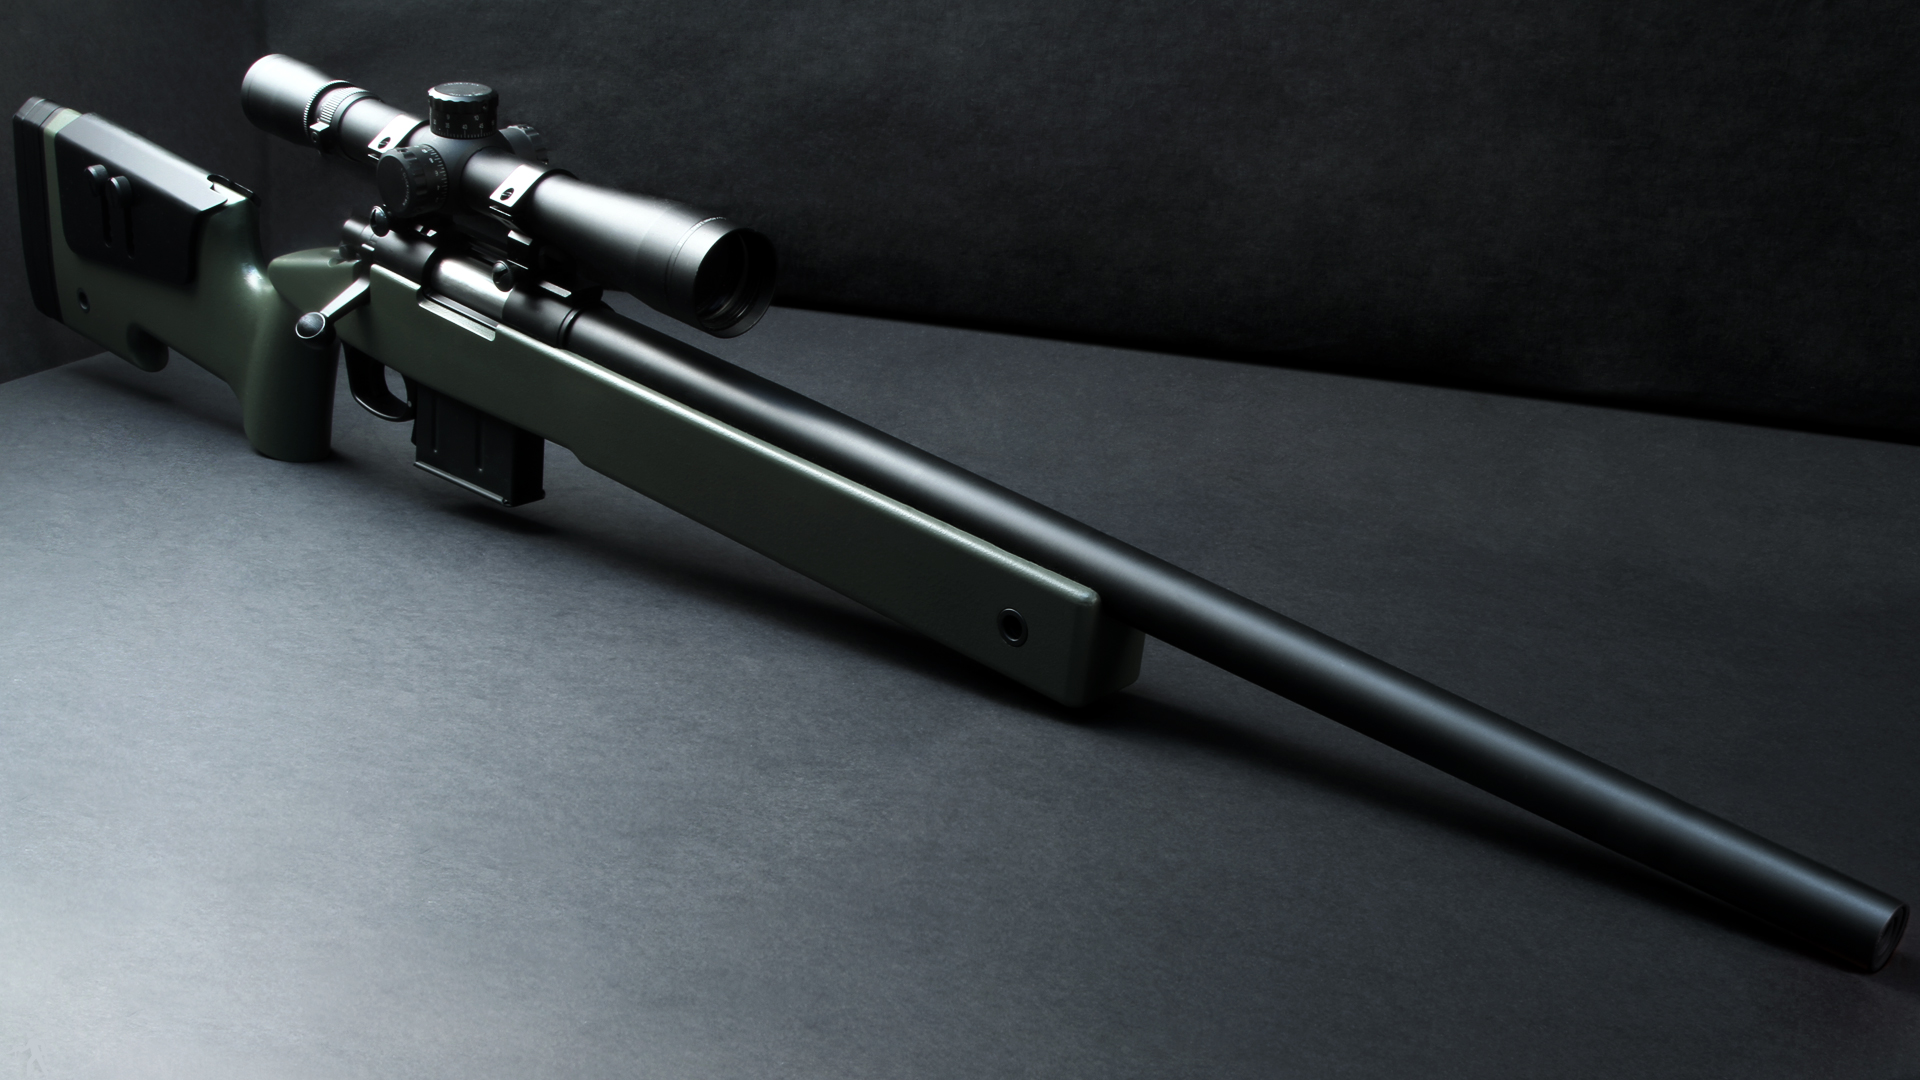 ARES M40A5 USMC Sniper Rifle Pototype 1920x1080